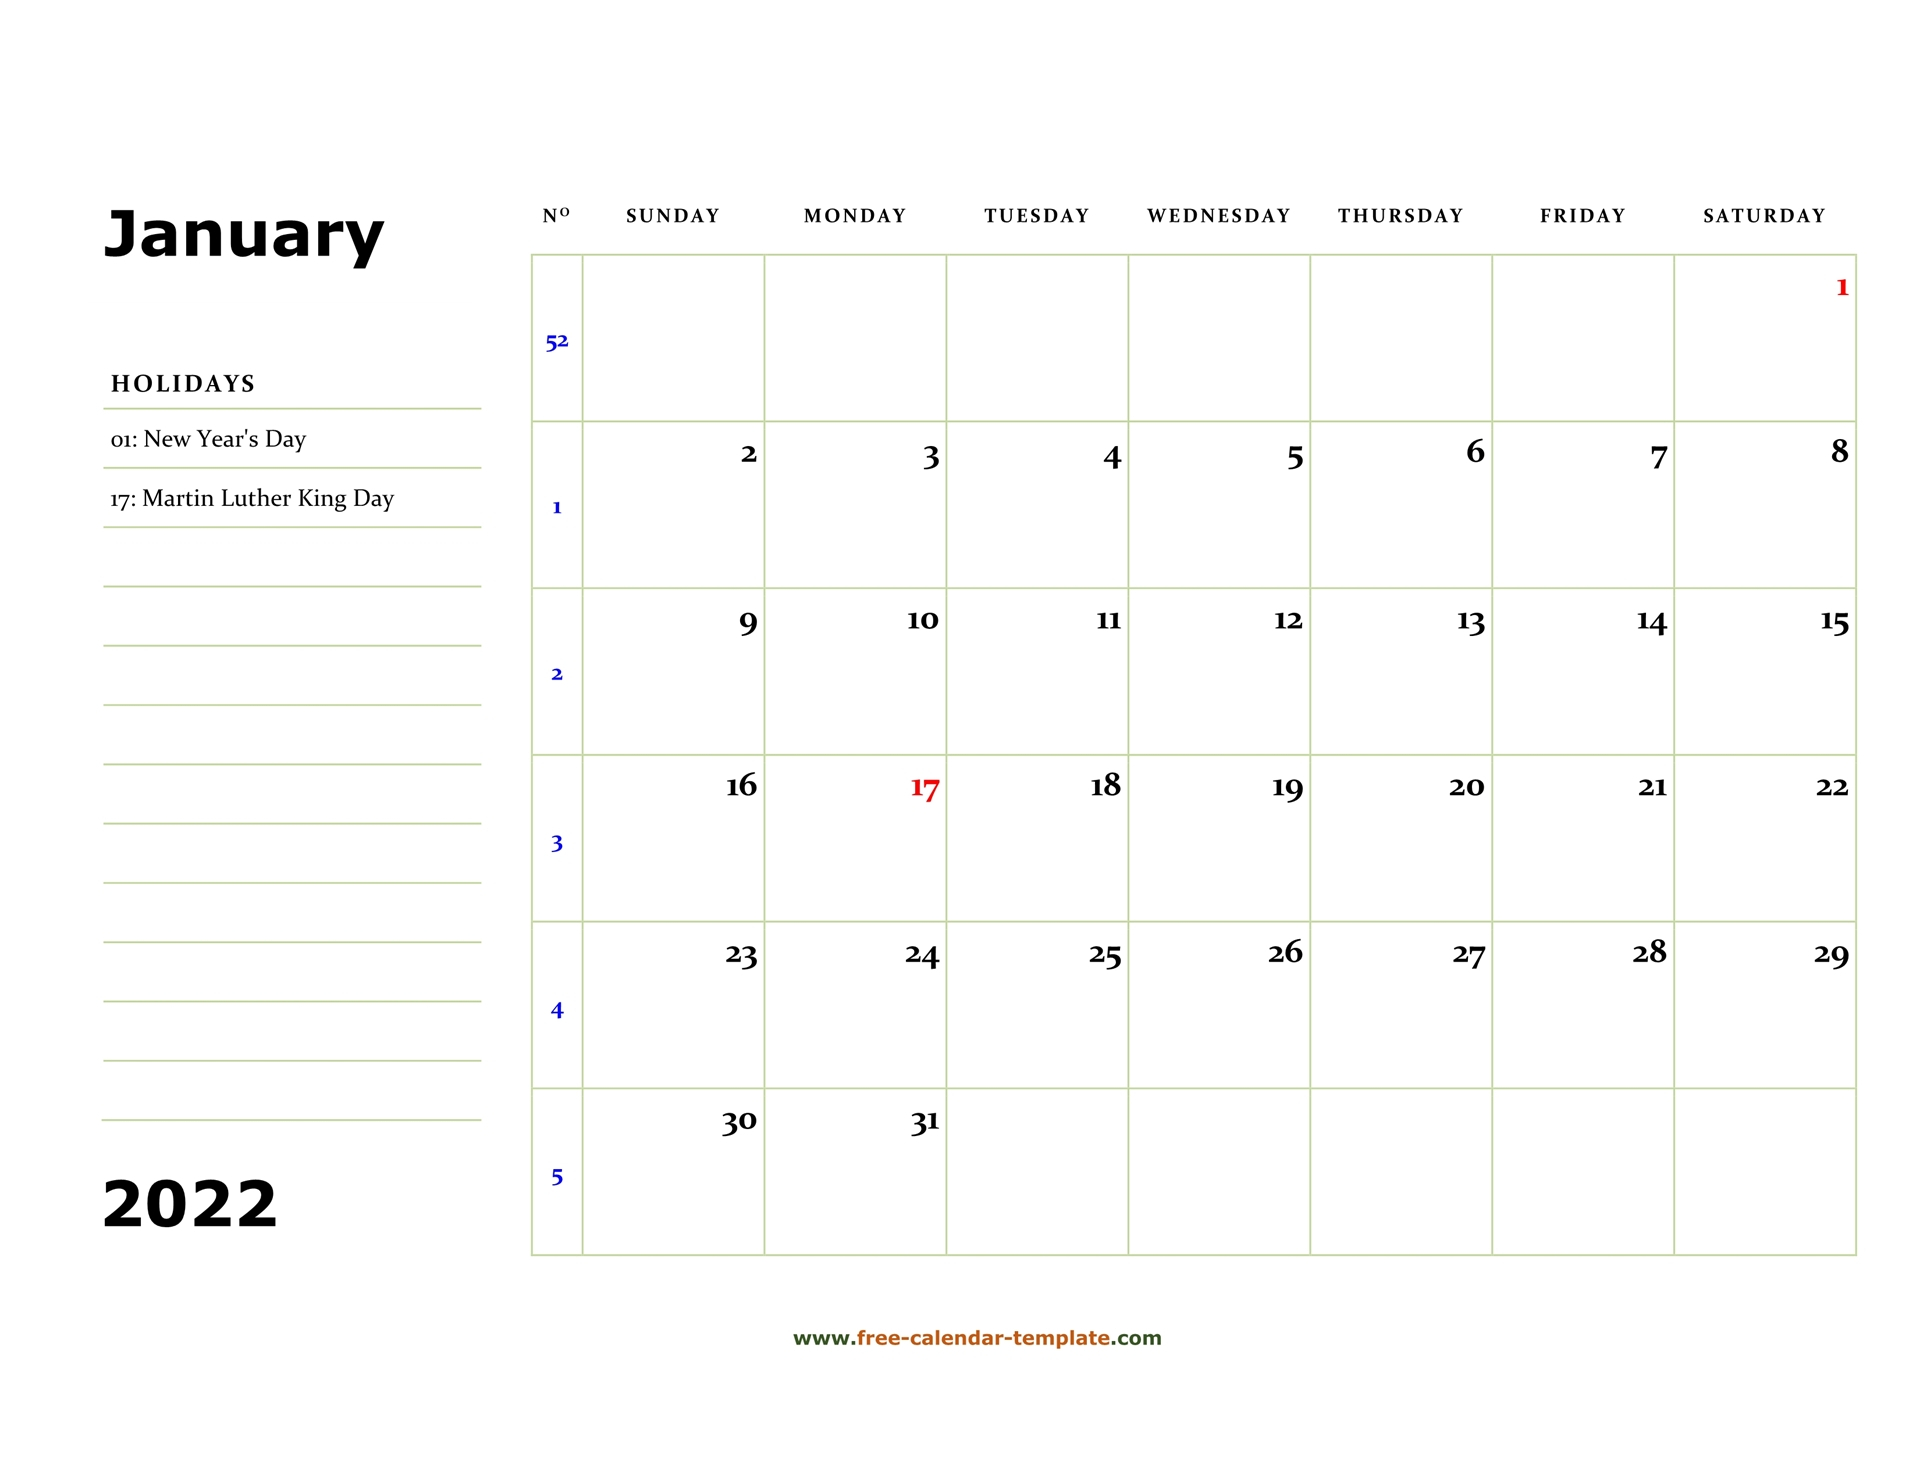 January 2022 Free Calendar Tempplate   Free Calendar Throughout Monthly Calendar 2022 January